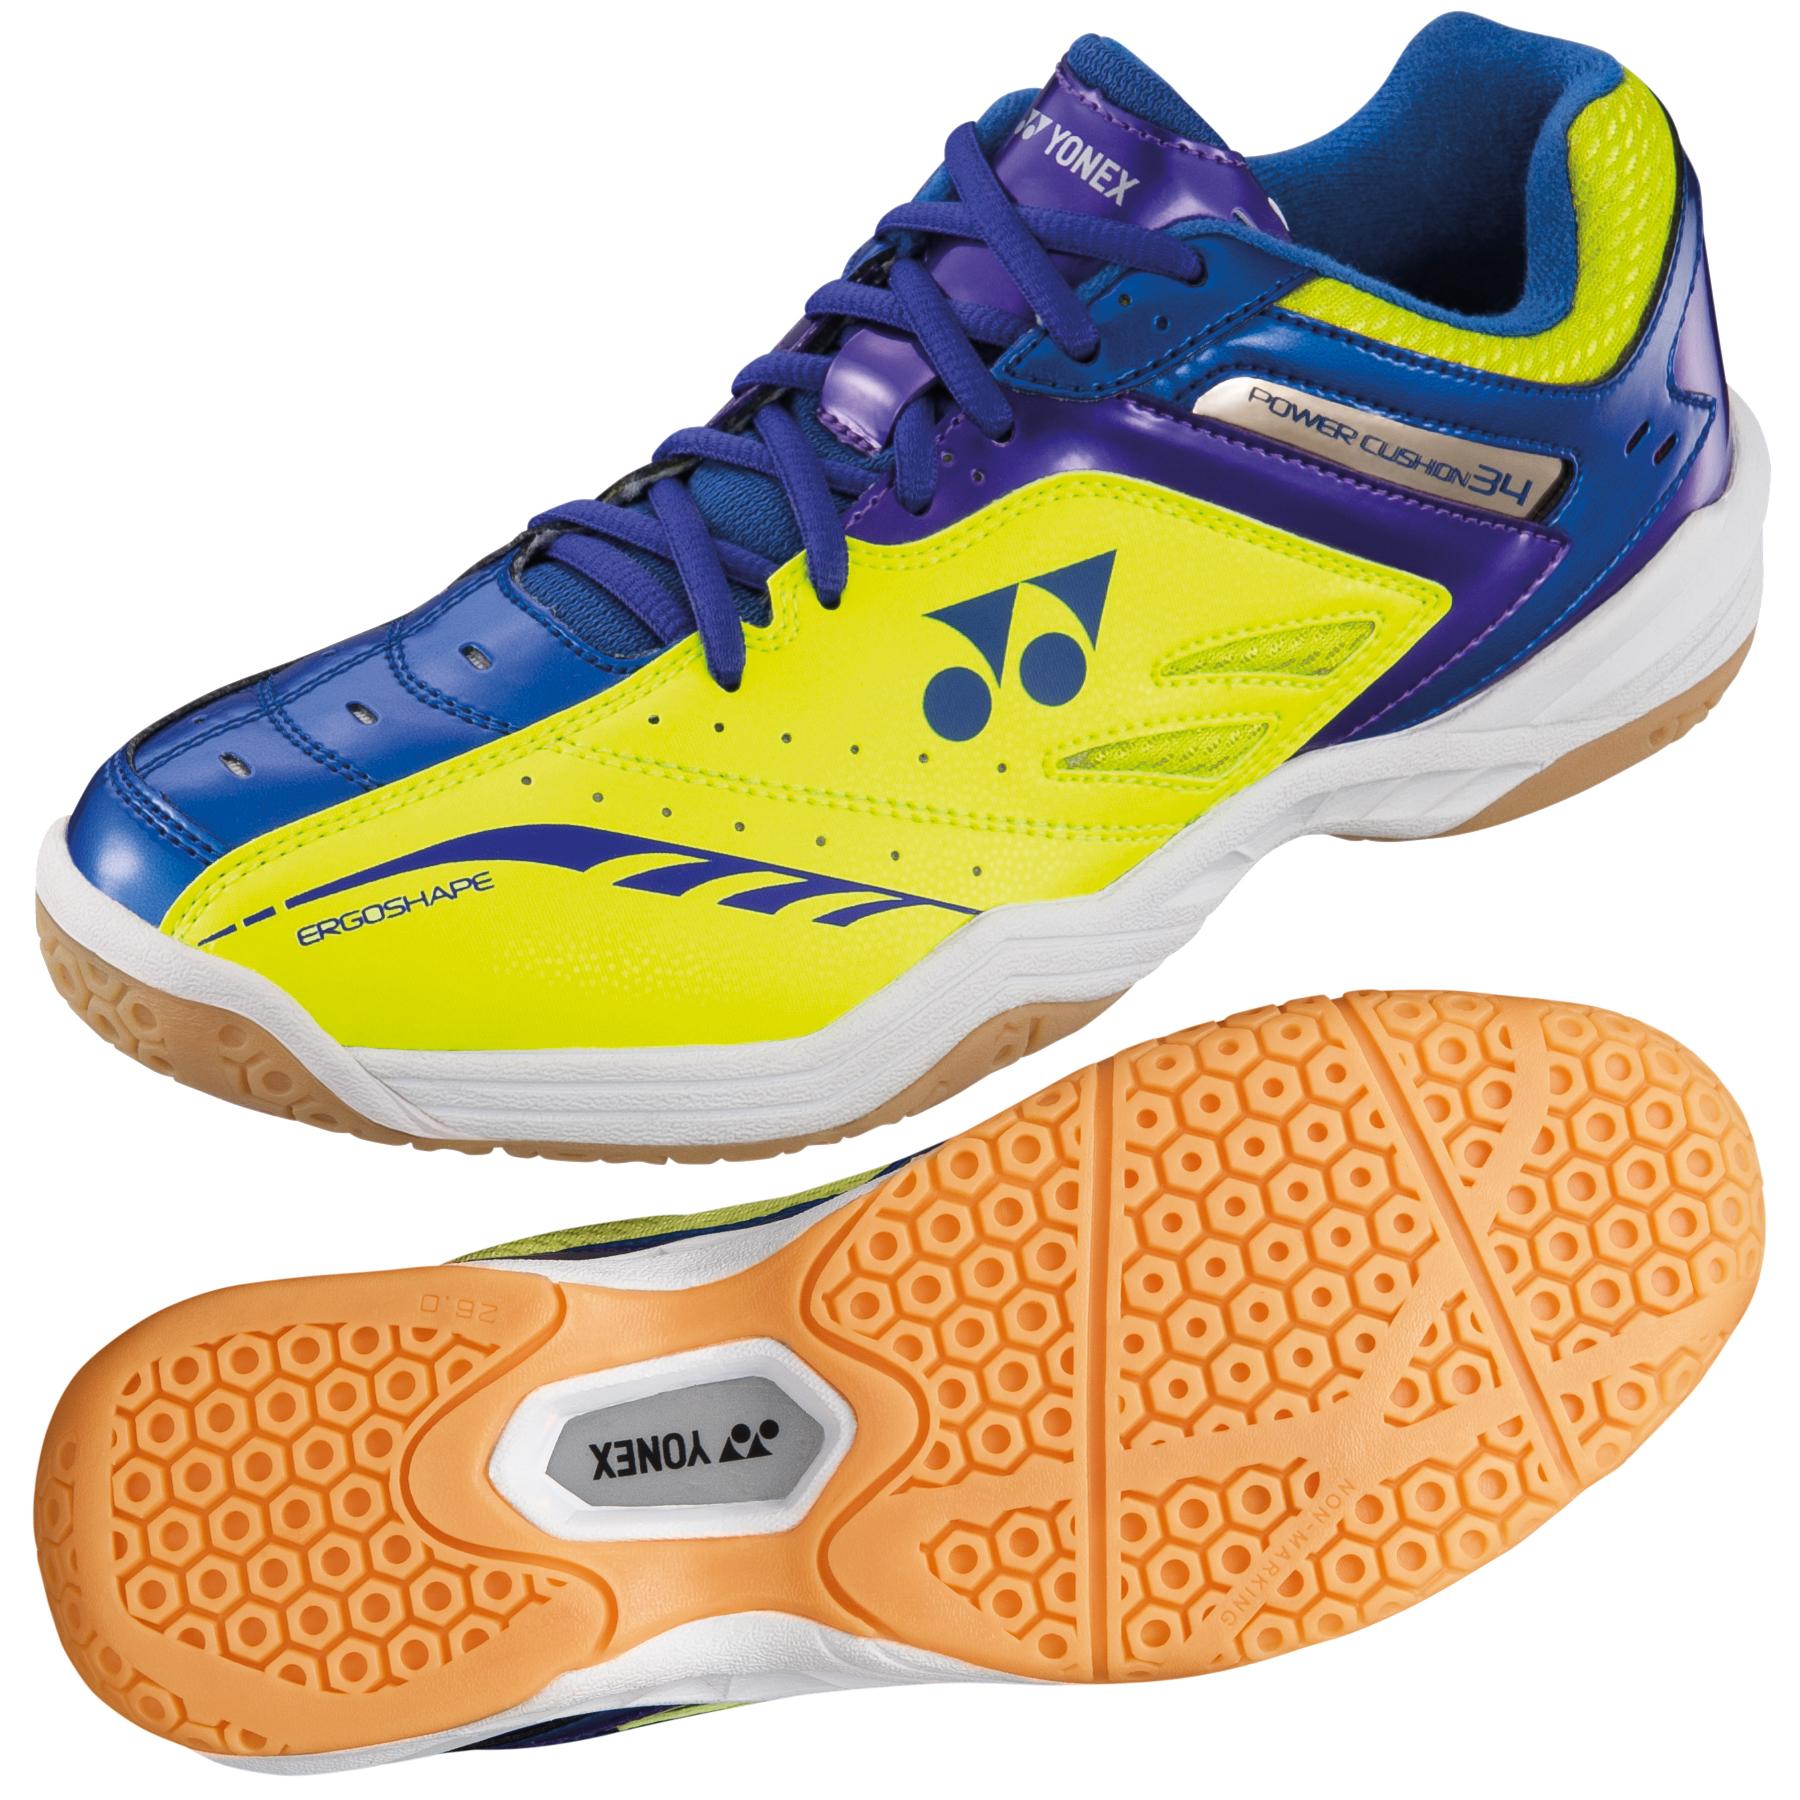 Yonex Power Cushion 34 Mens Badminton Shoes  YellowBlue 11 UK